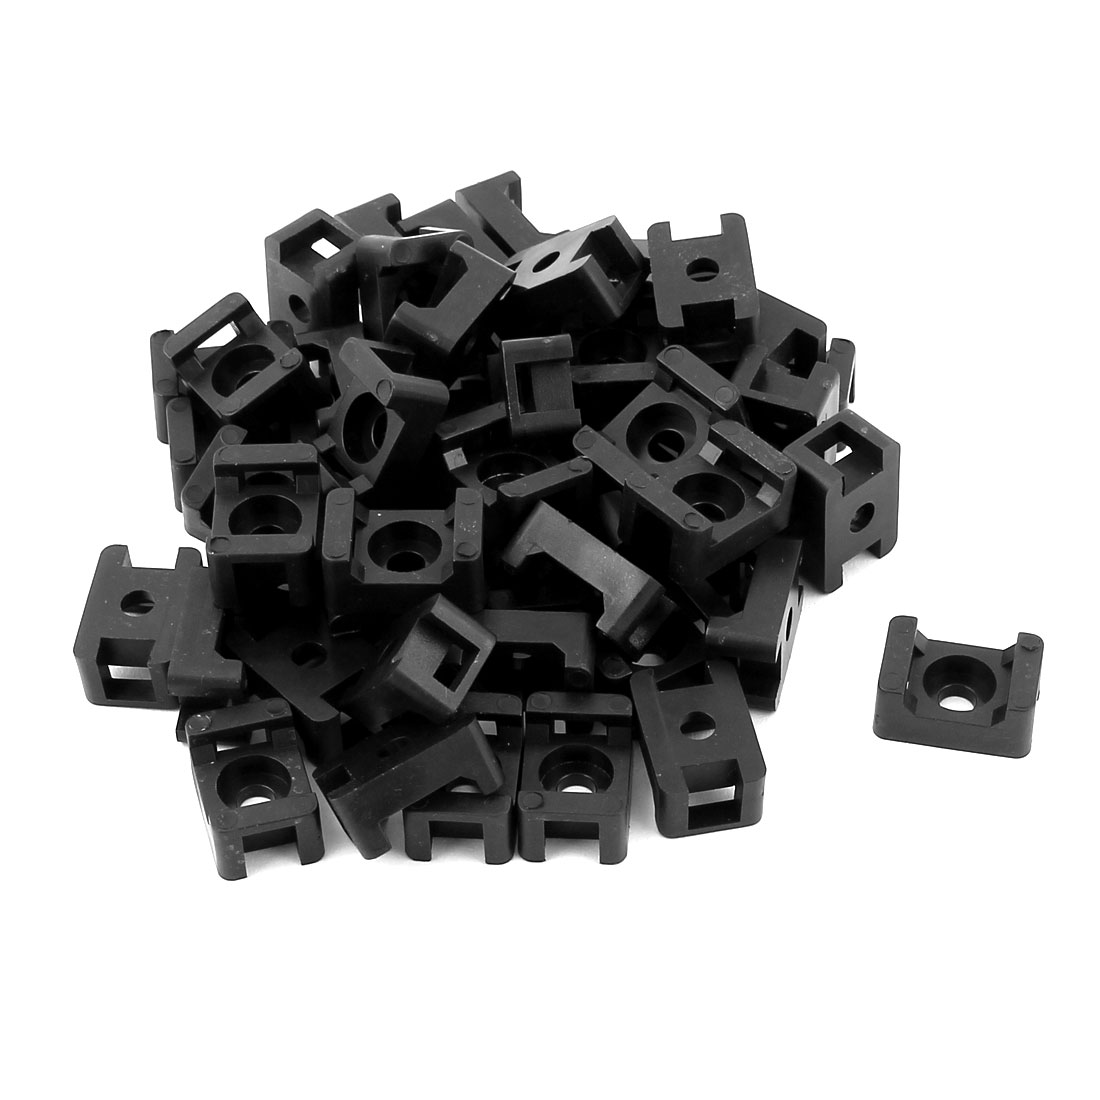 50pcs Black Plastic Screw Mounts Saddles Bases Cable Tie Cradle Holder